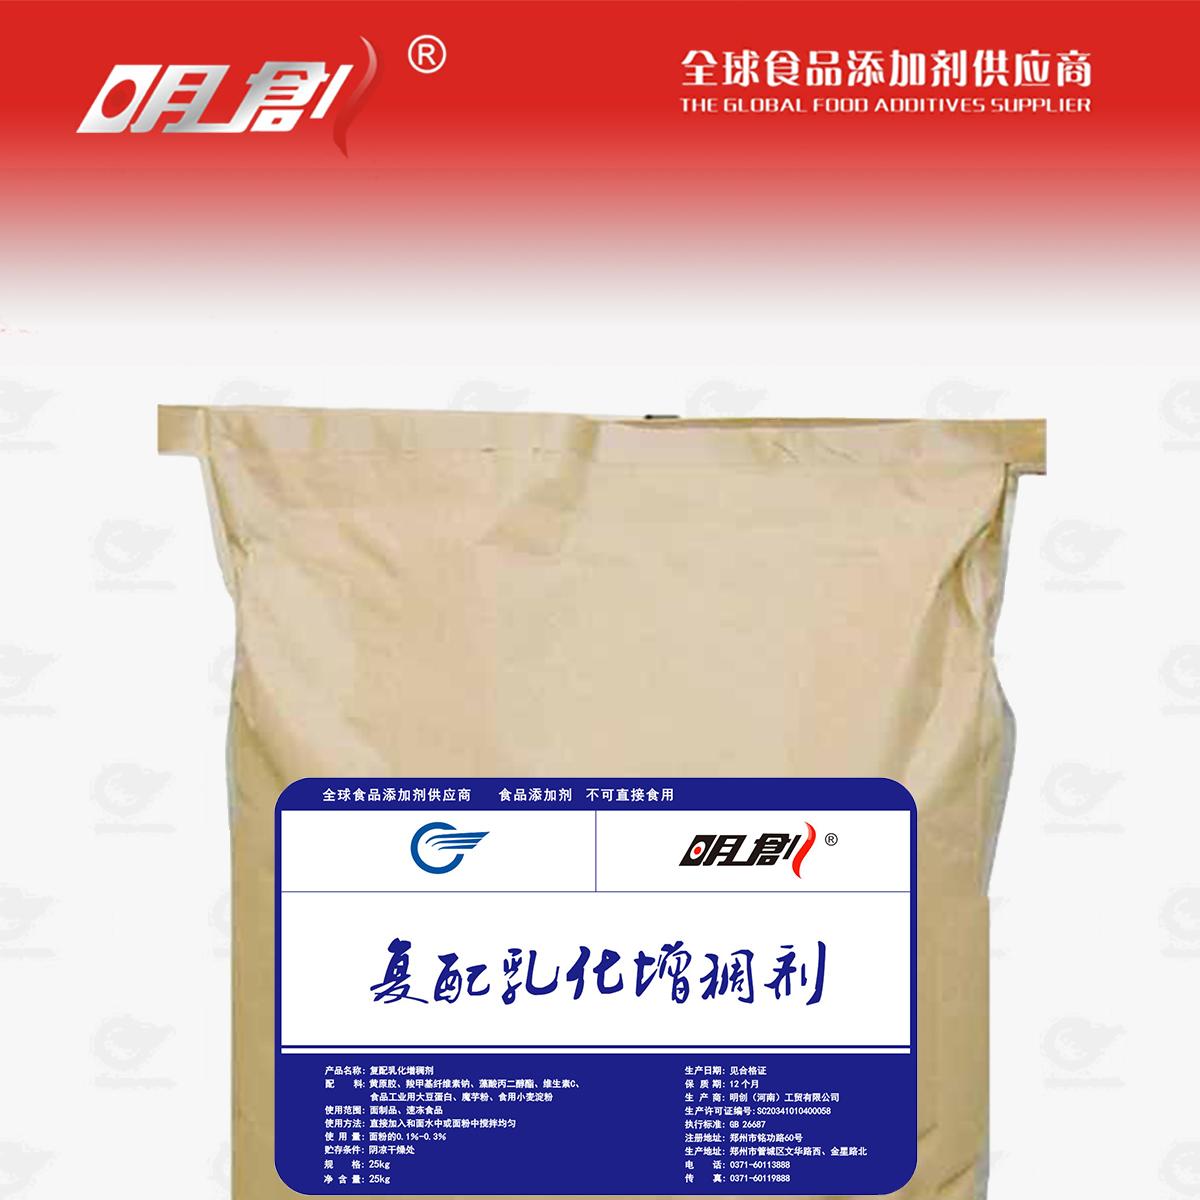 compound emulsion and thickening,Complex emulsion thickener